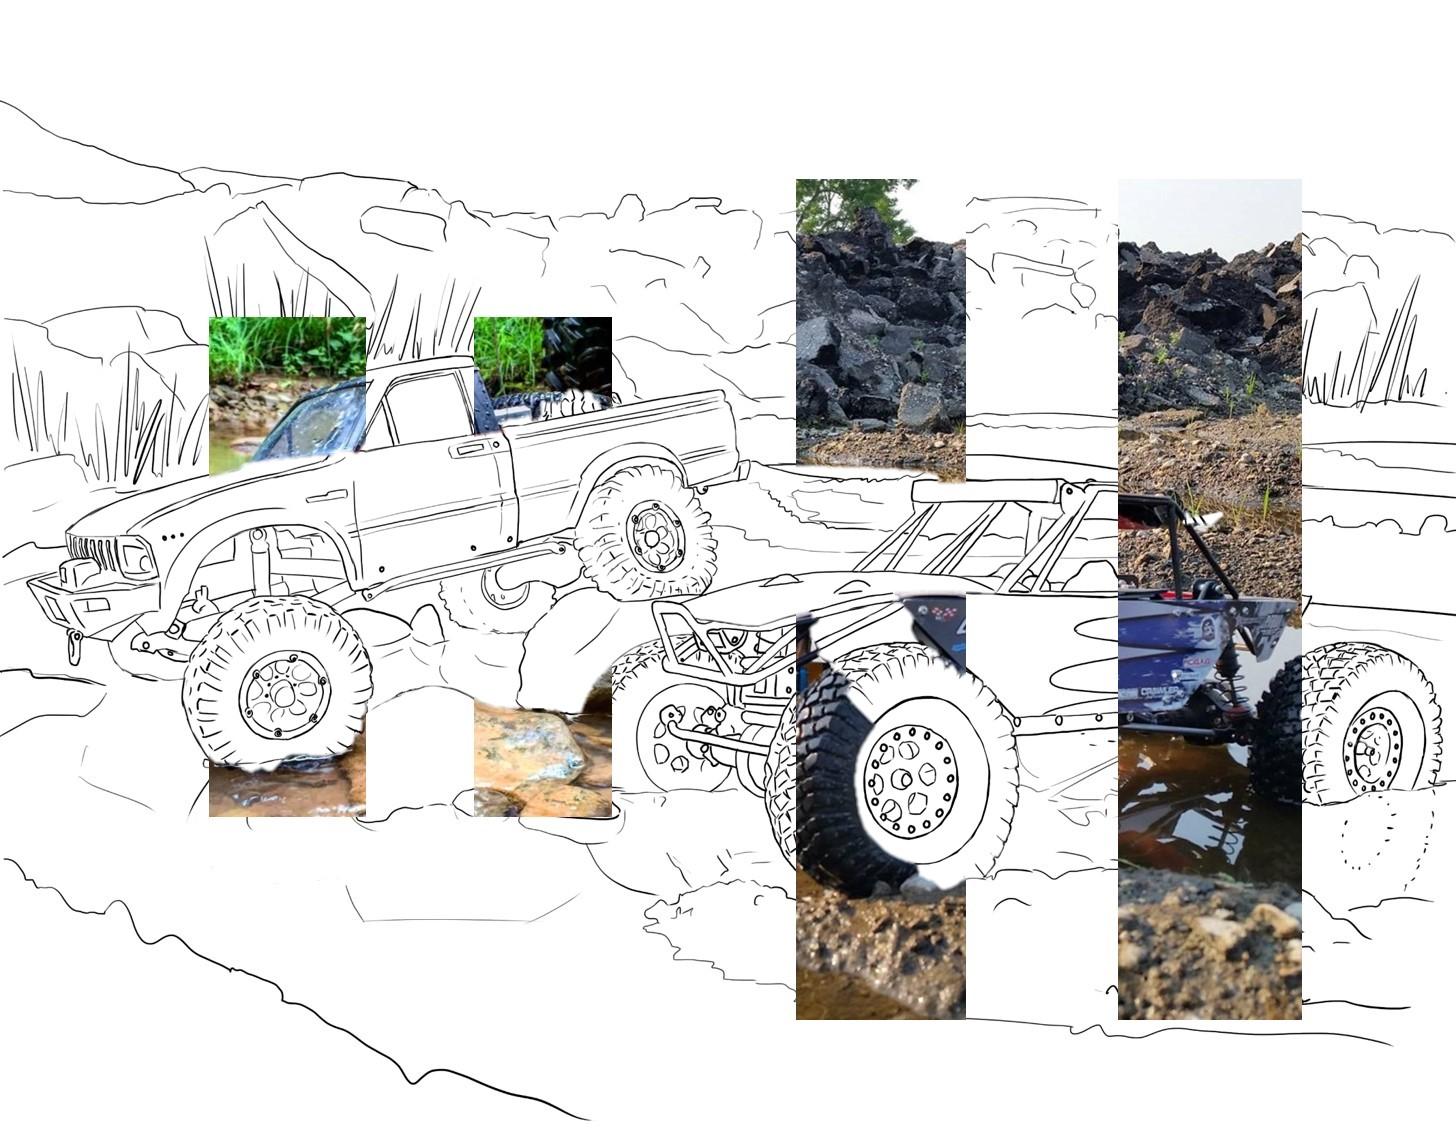 SHEEPISH ANIMATION: Utah RC Coloring Book: Artist Process